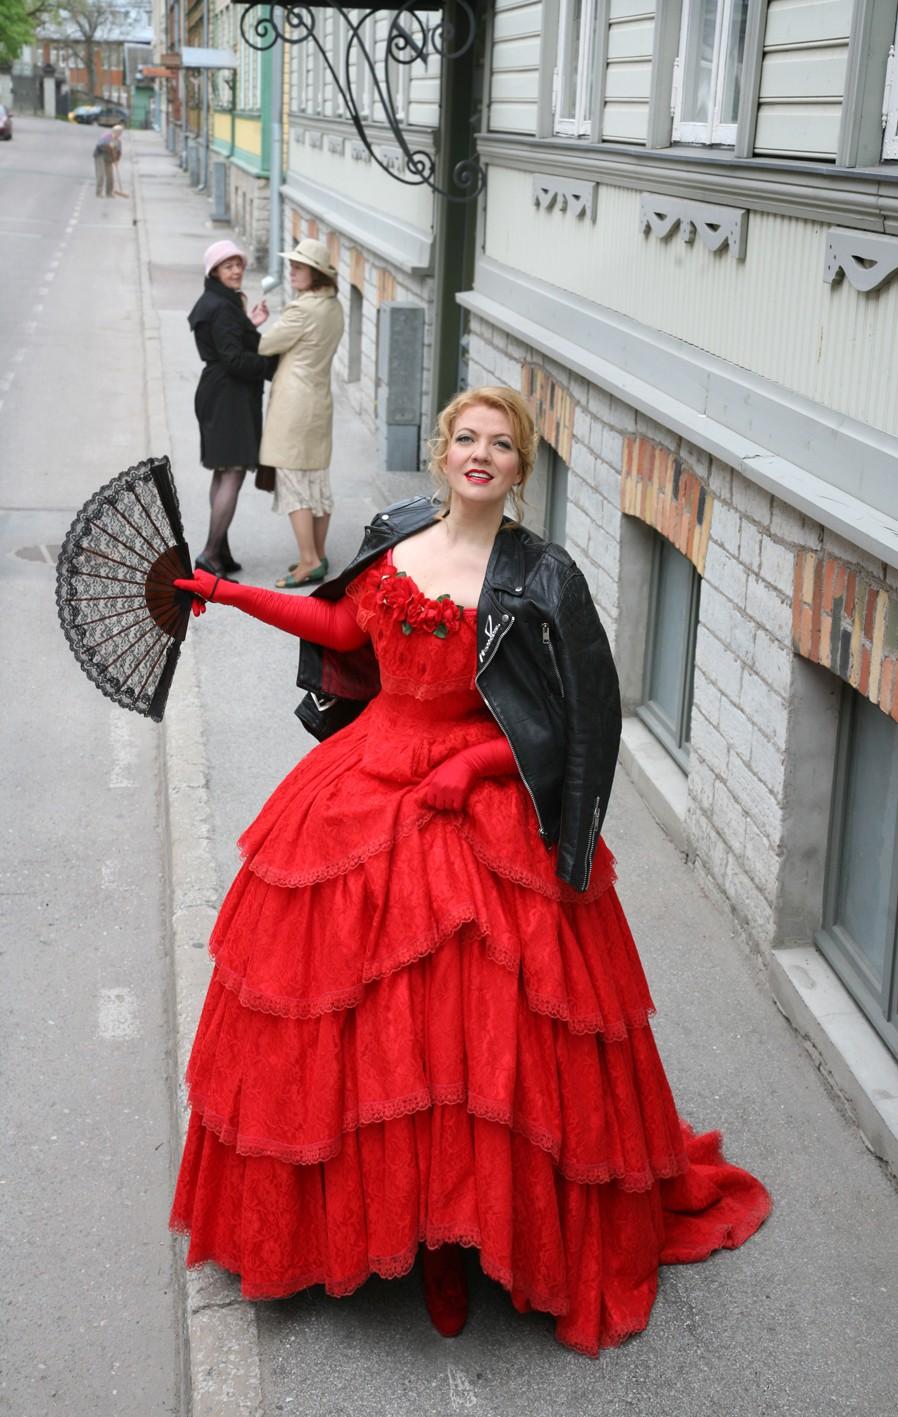 """Violetta in the old town of Tallinn"" (photo: Toomas Volkmann)"